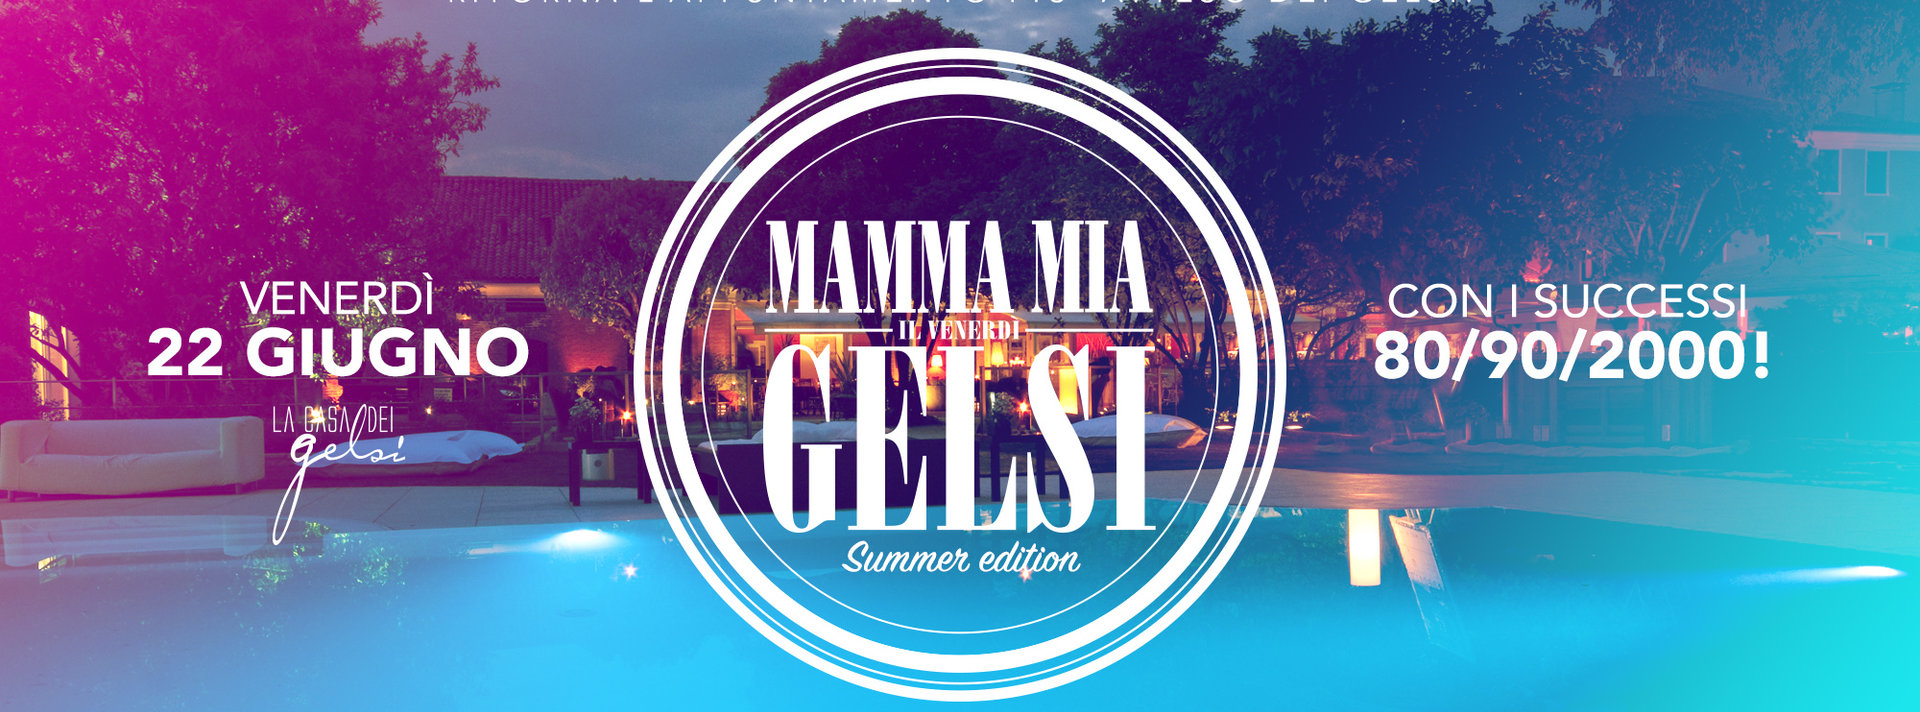 Mammamia Gelsi - Summer Edition